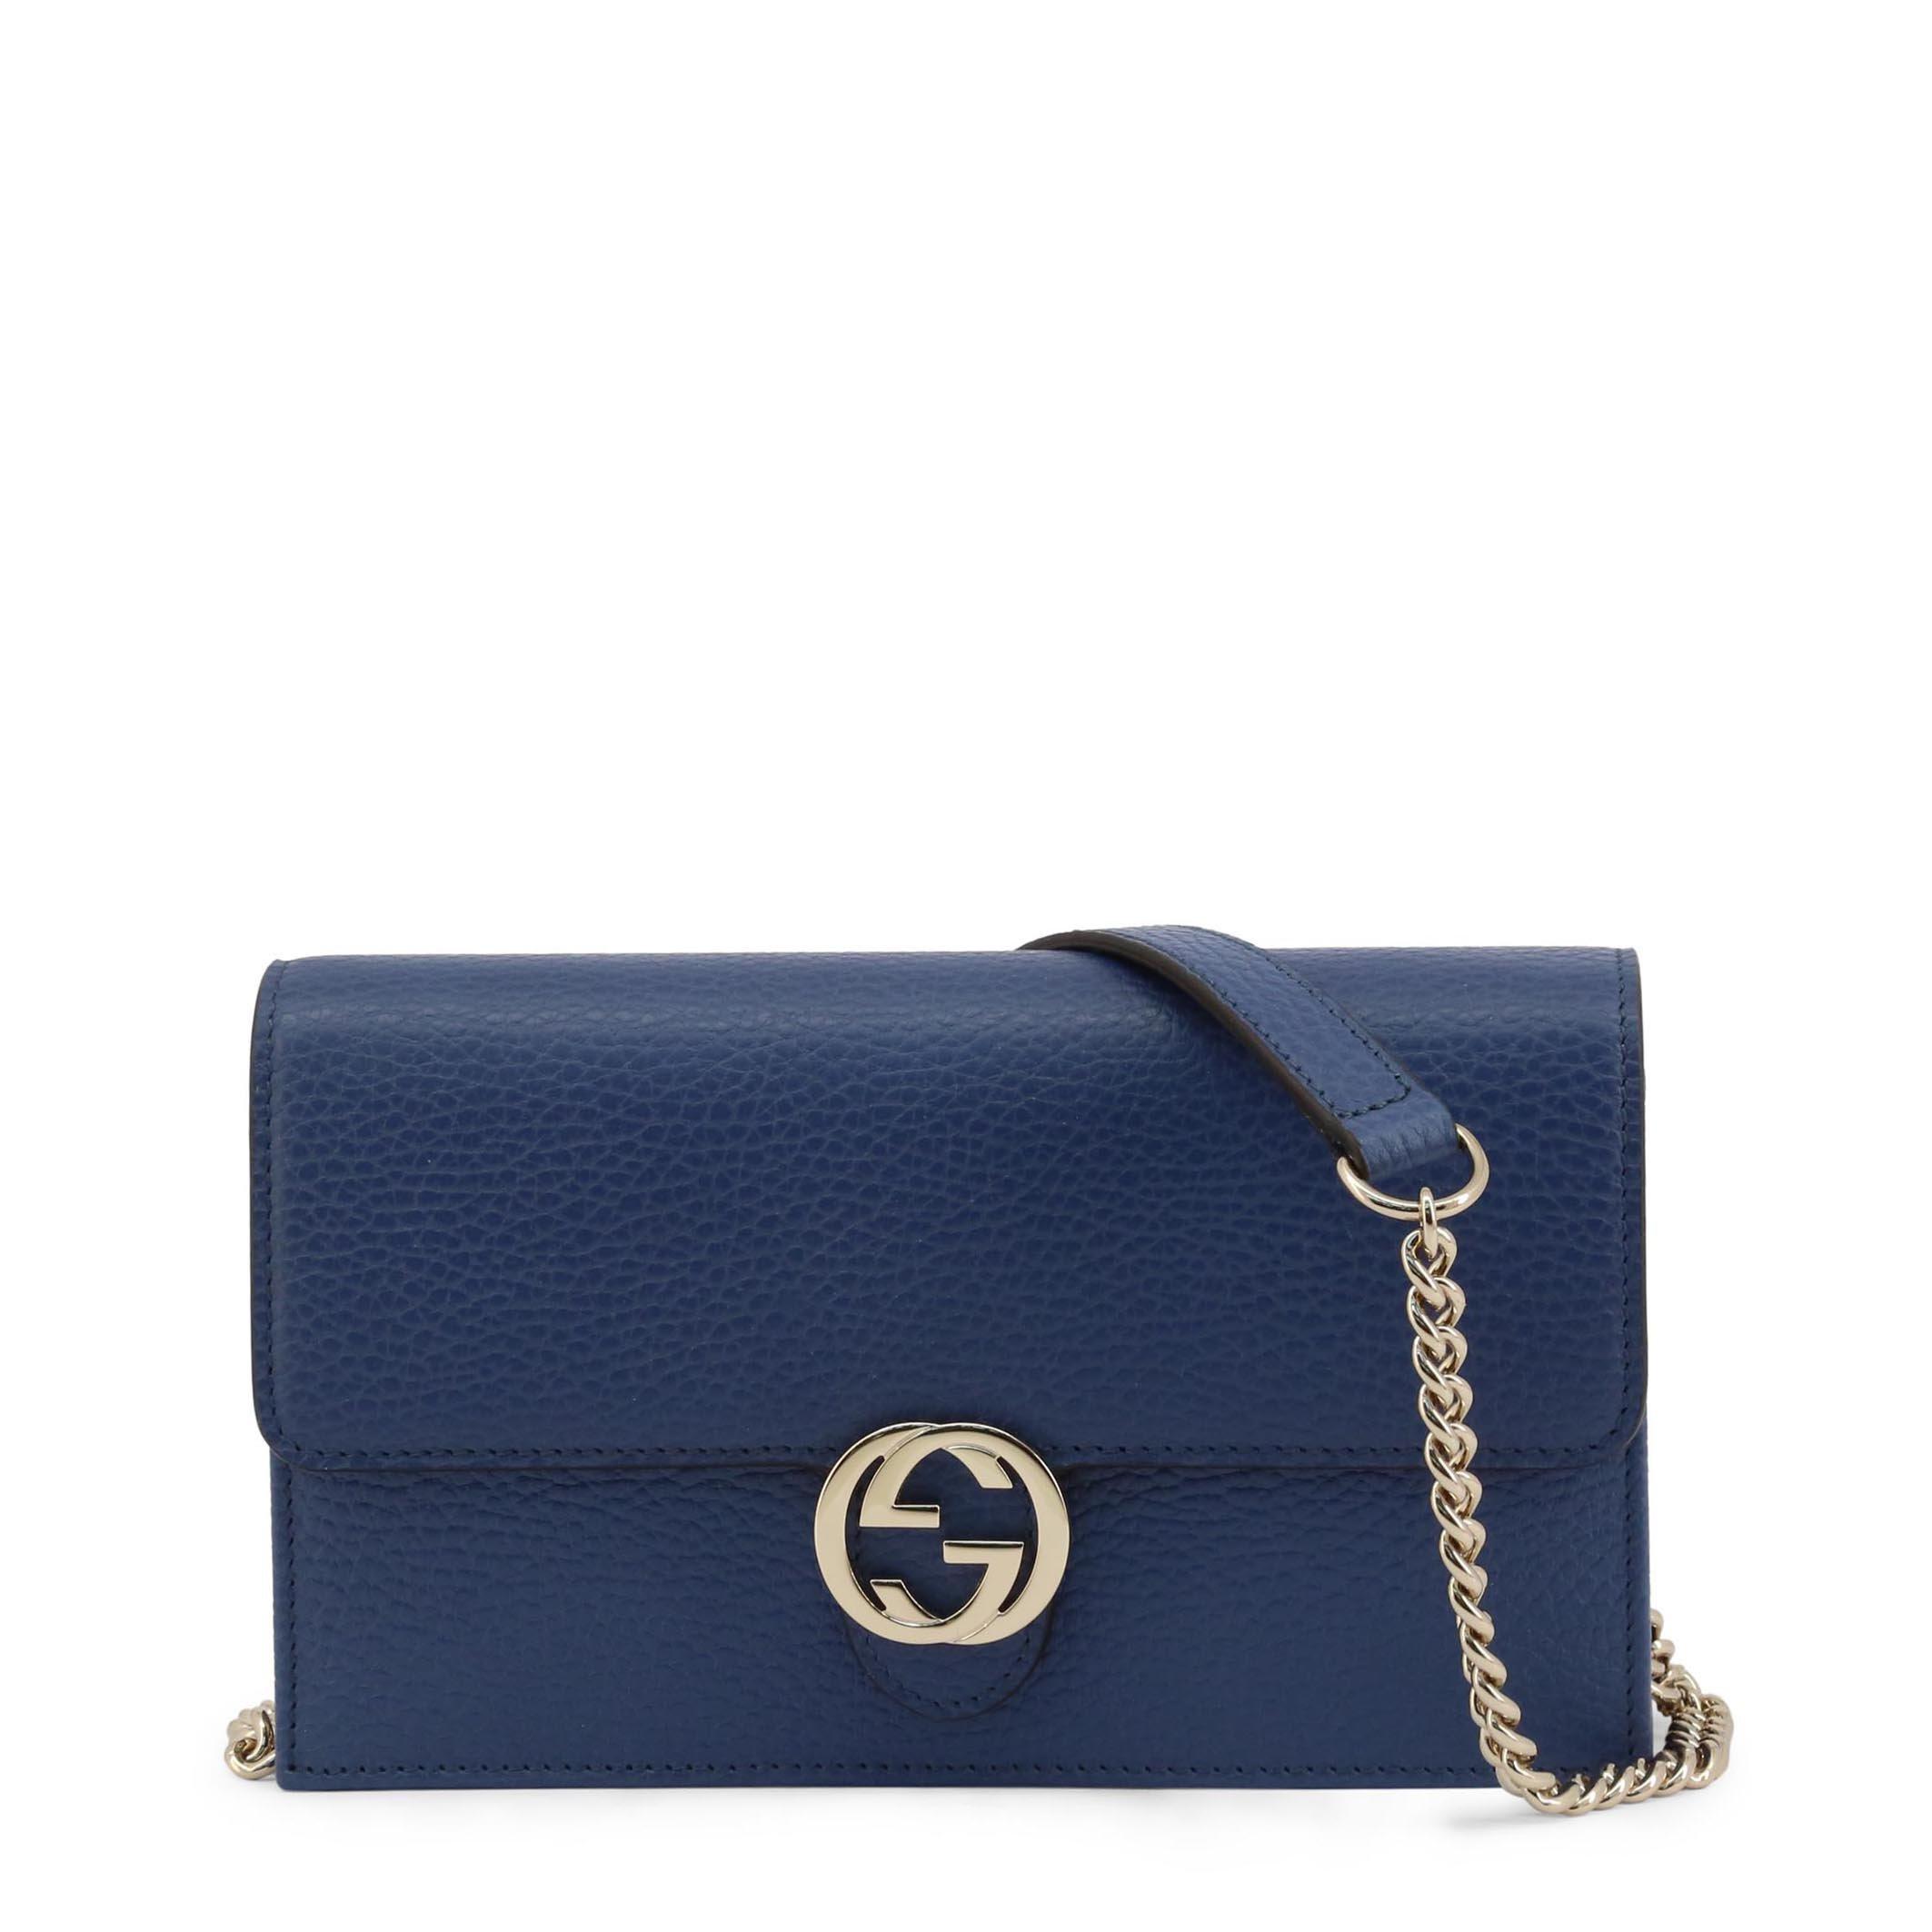 Gucci Women's Crossbody Bag Various Colours 510314_CA00G - blue NOSIZE